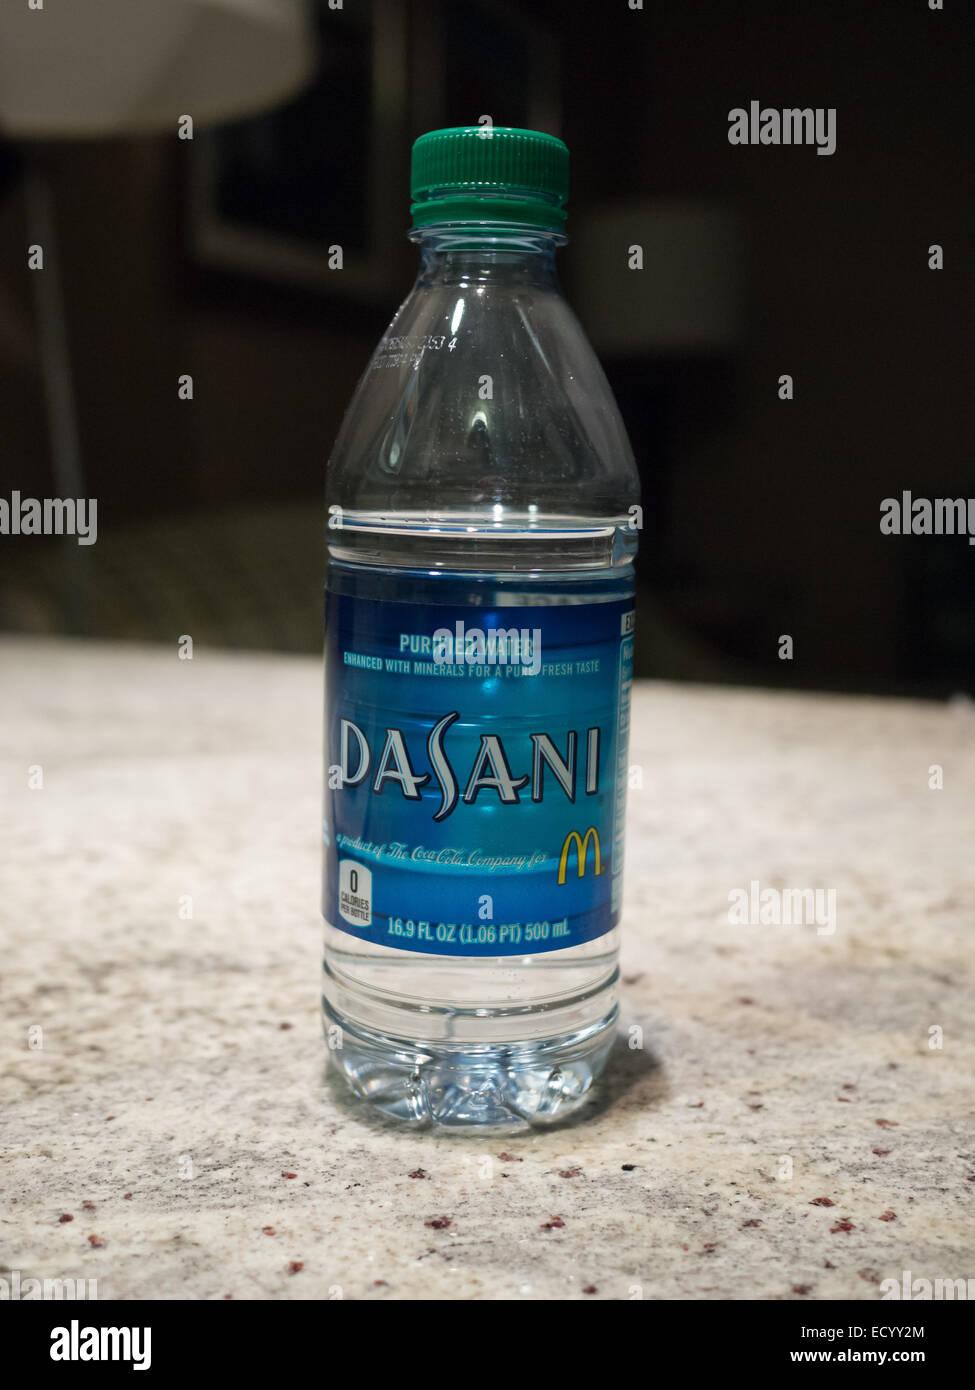 L'eau embouteillée Dasani Photo Stock